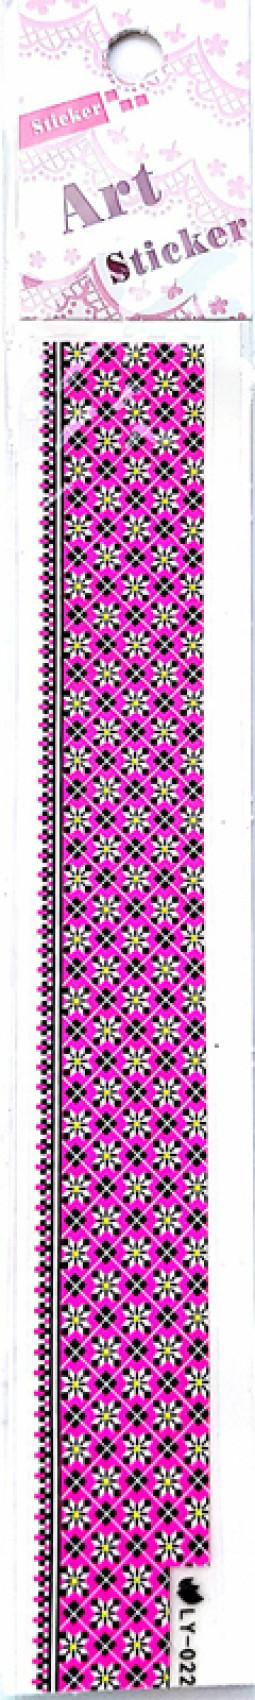 Köröm  matrica ,öntapadós, LY-022  022